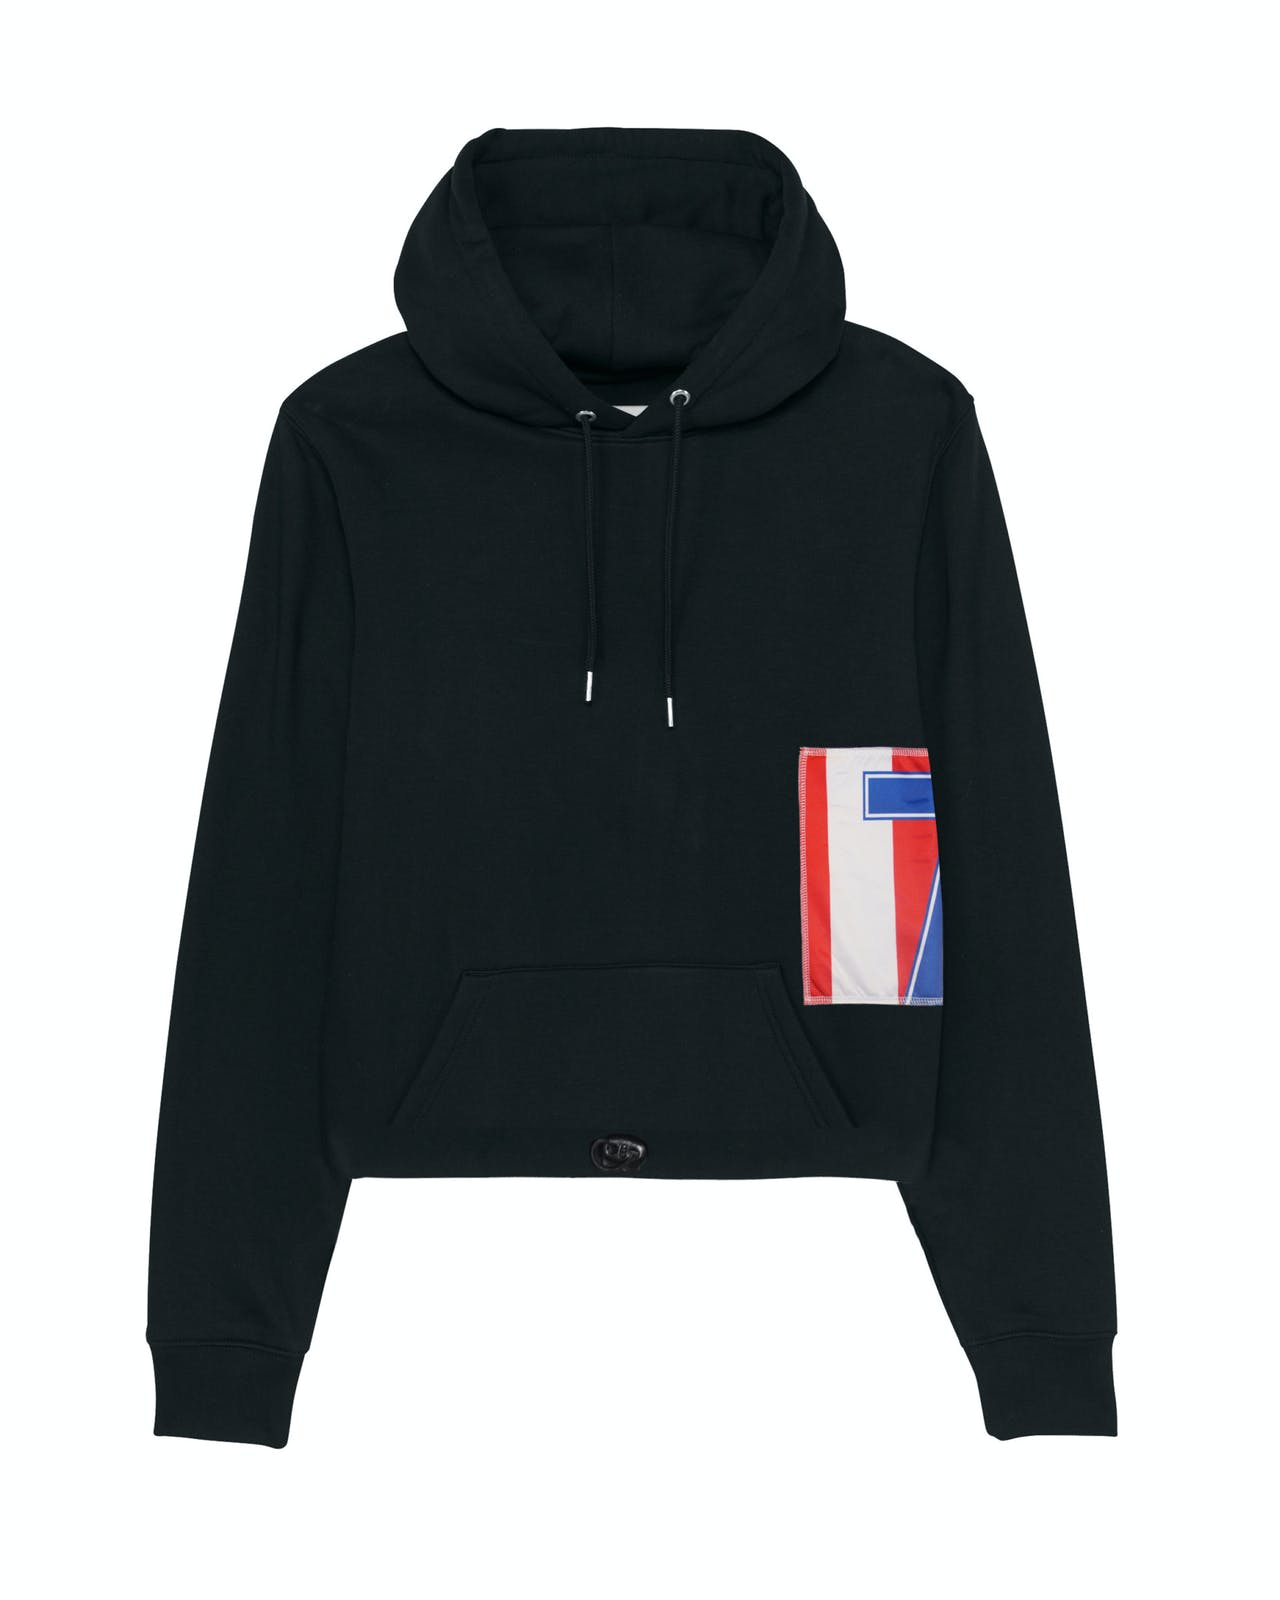 Remix hoodie black